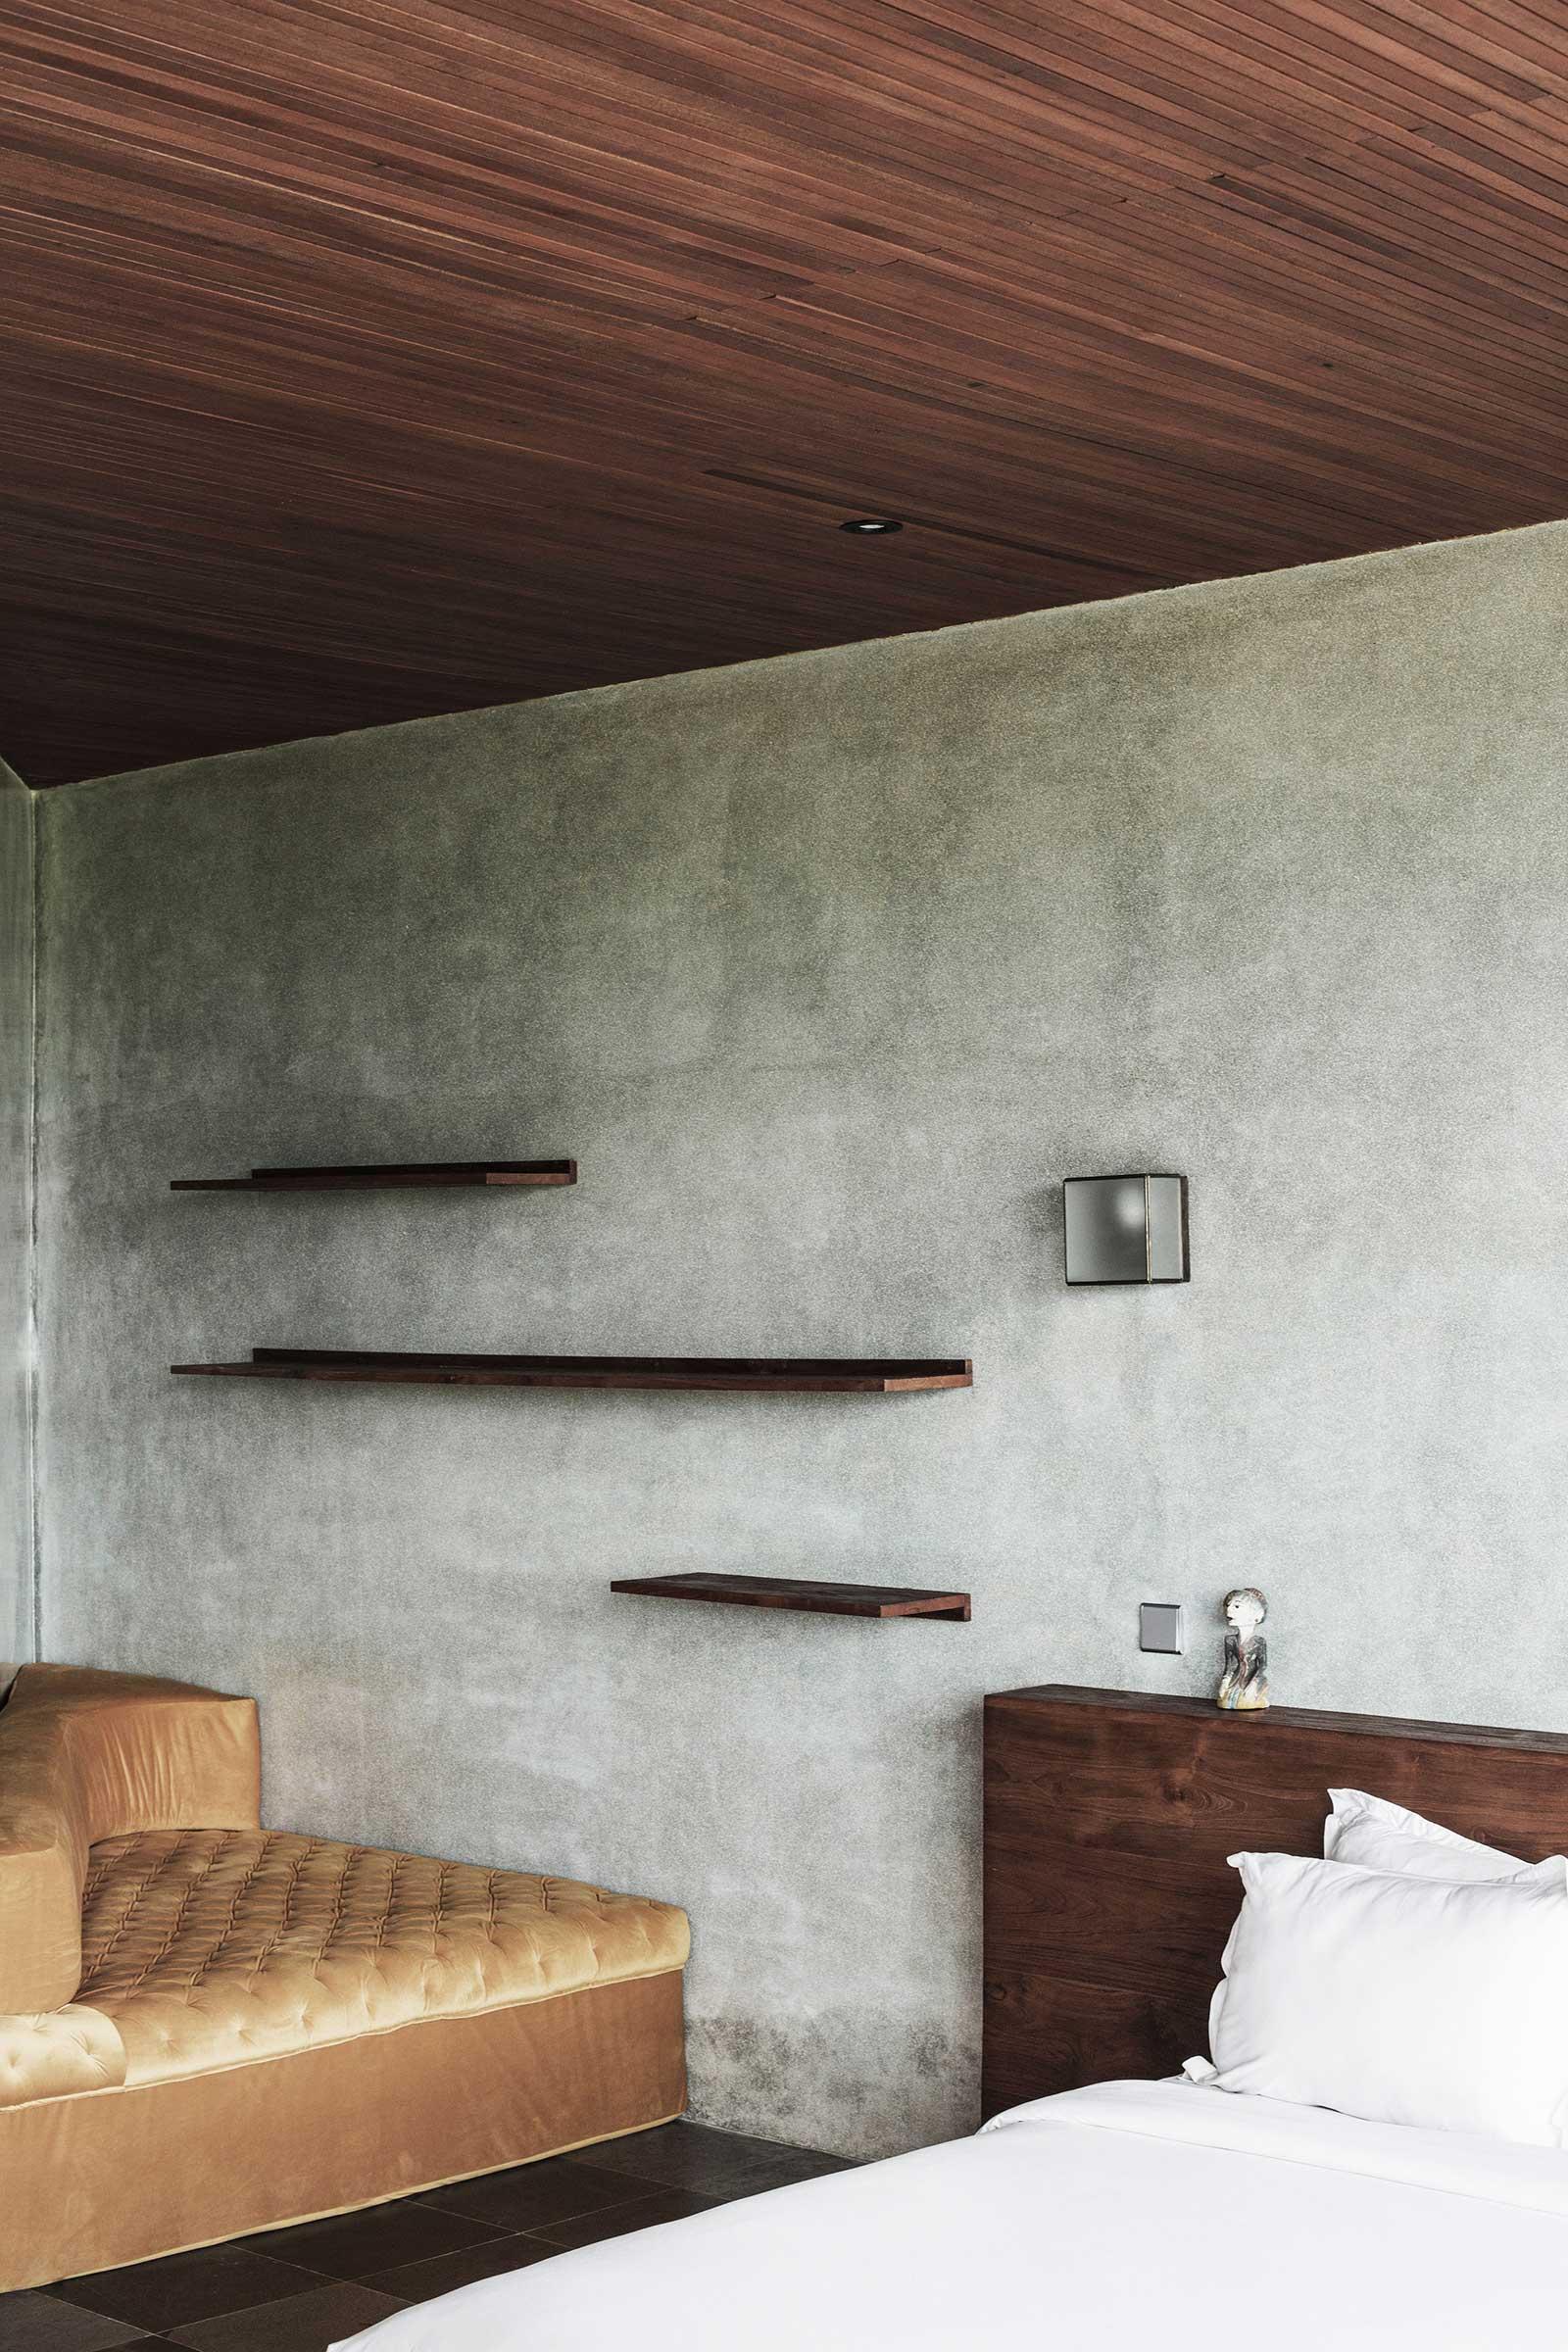 Flow-House---Interiors-(Room-3)-(8-of-8).jpg